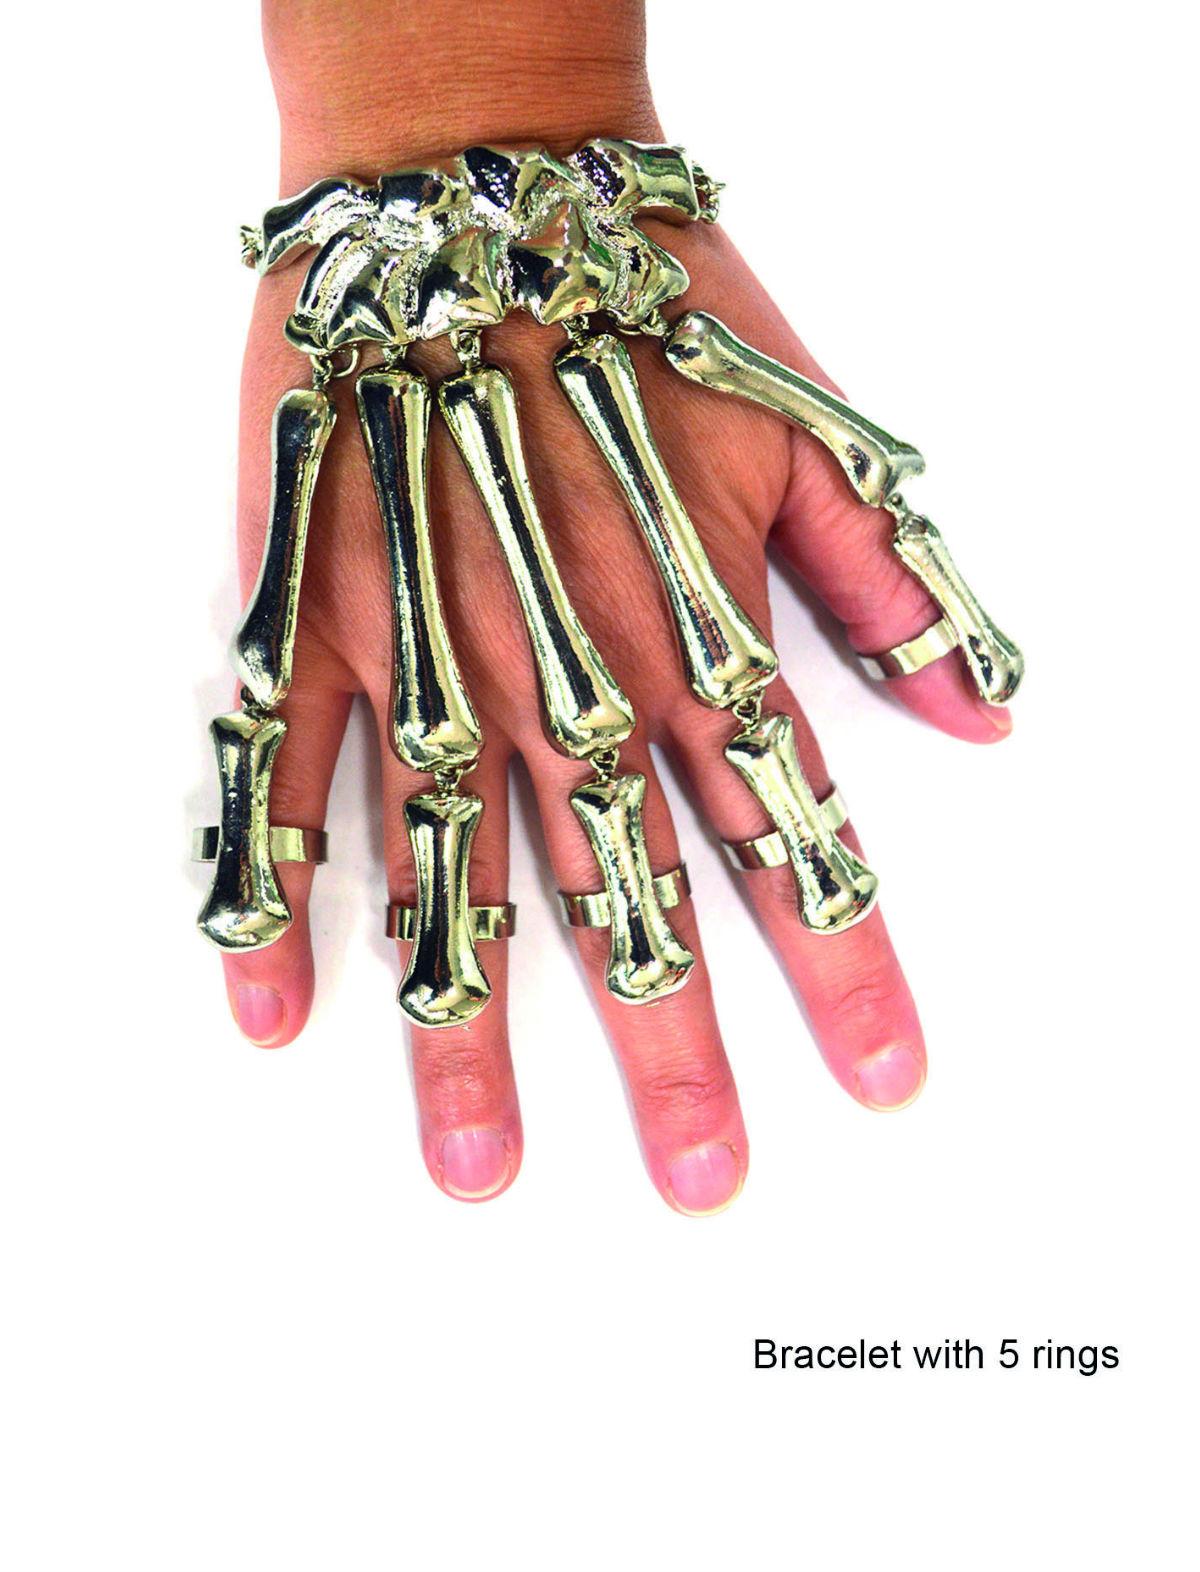 Handschmuck Knochen